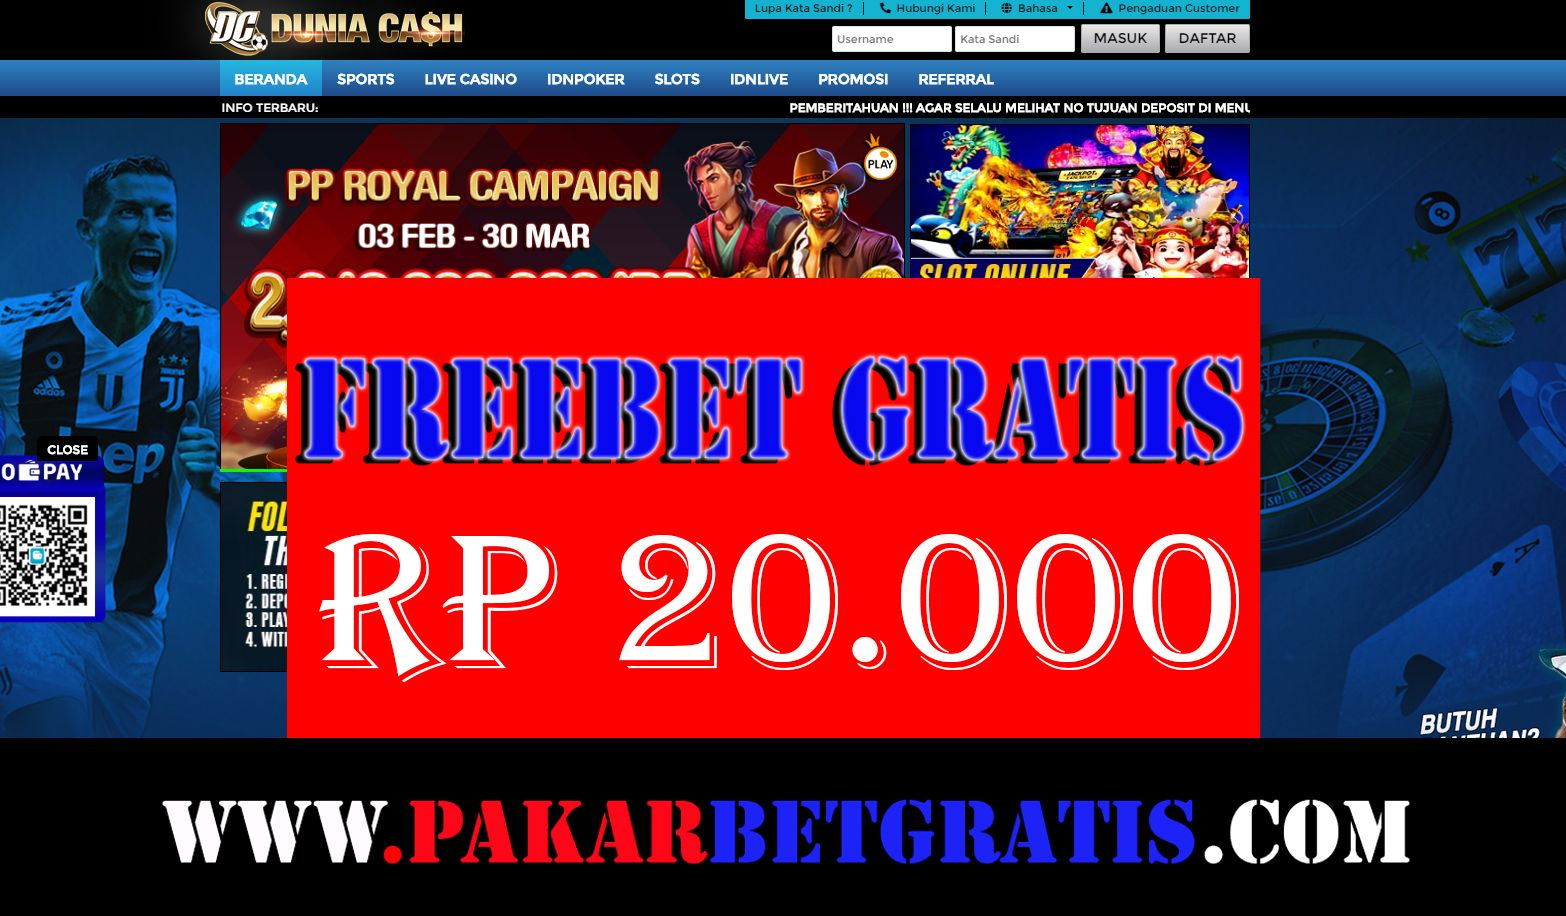 Freebet Casino Tanpa Deposit Daftar Situs Link Alternatif Judi Online Slot Kasino Mpo Terbaru